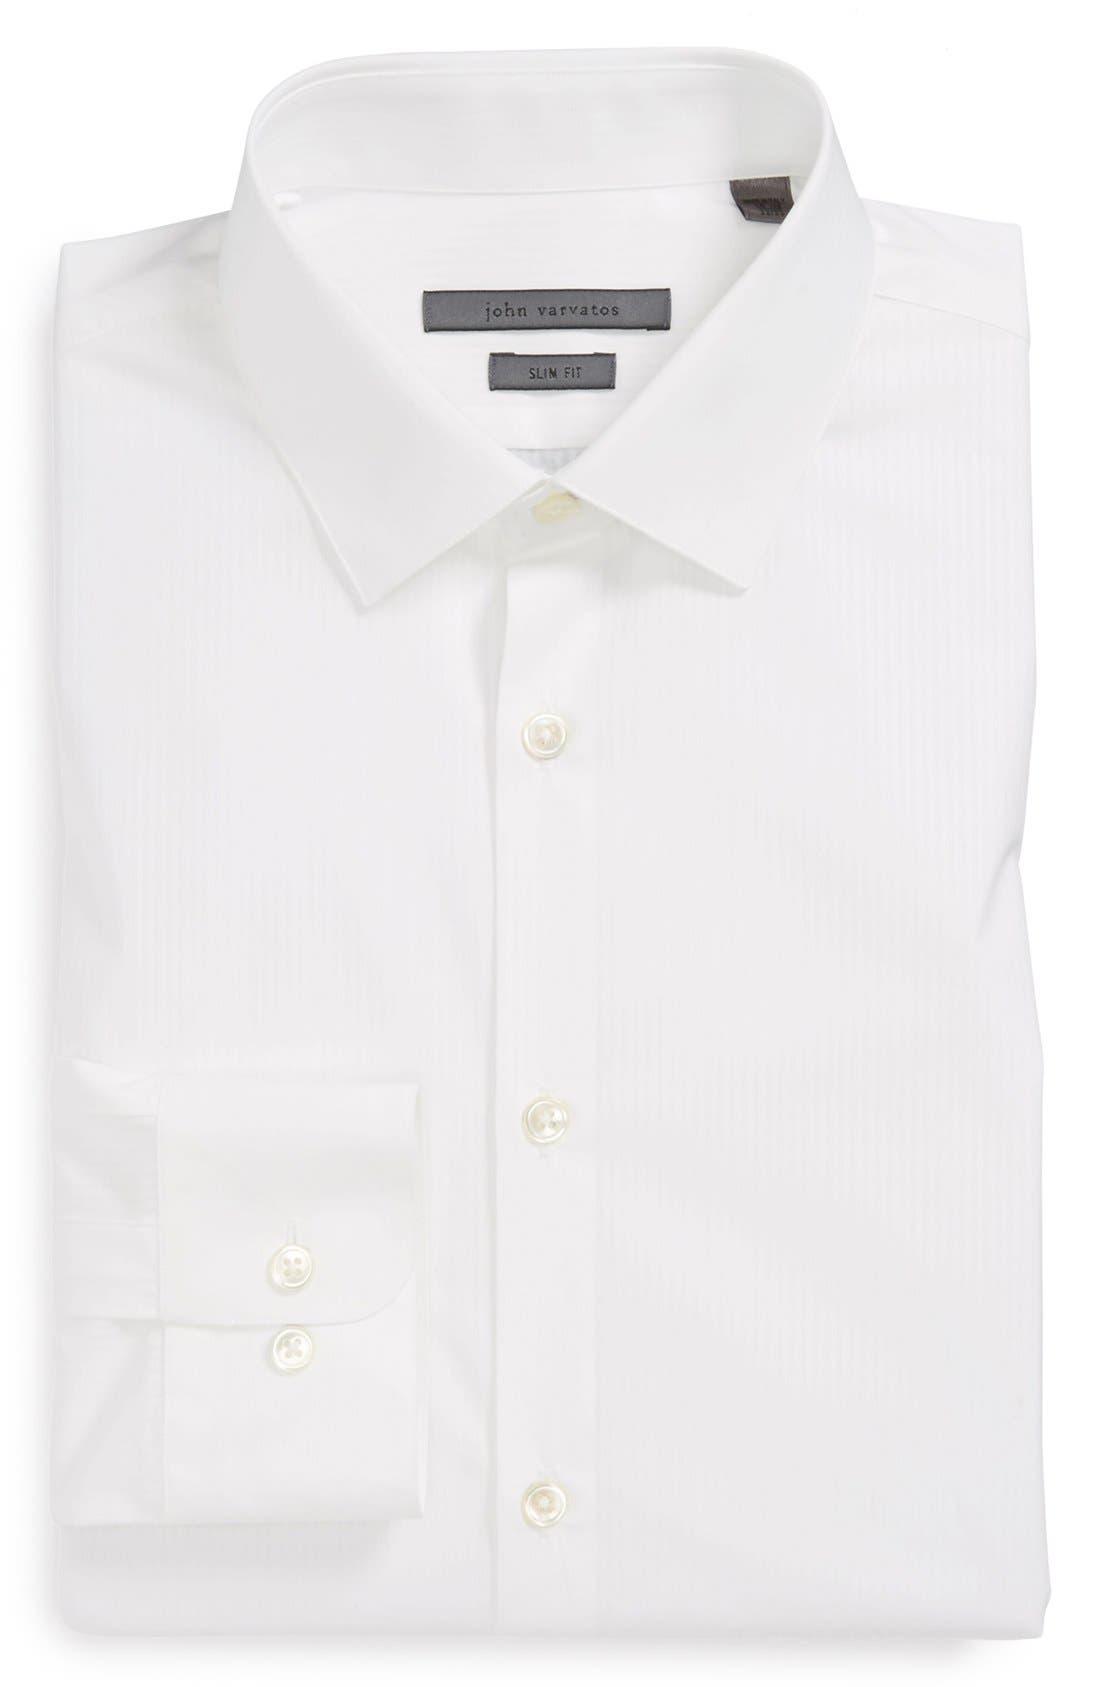 Alternate Image 1 Selected - John Varvatos Collection Slim Fit Dress Shirt